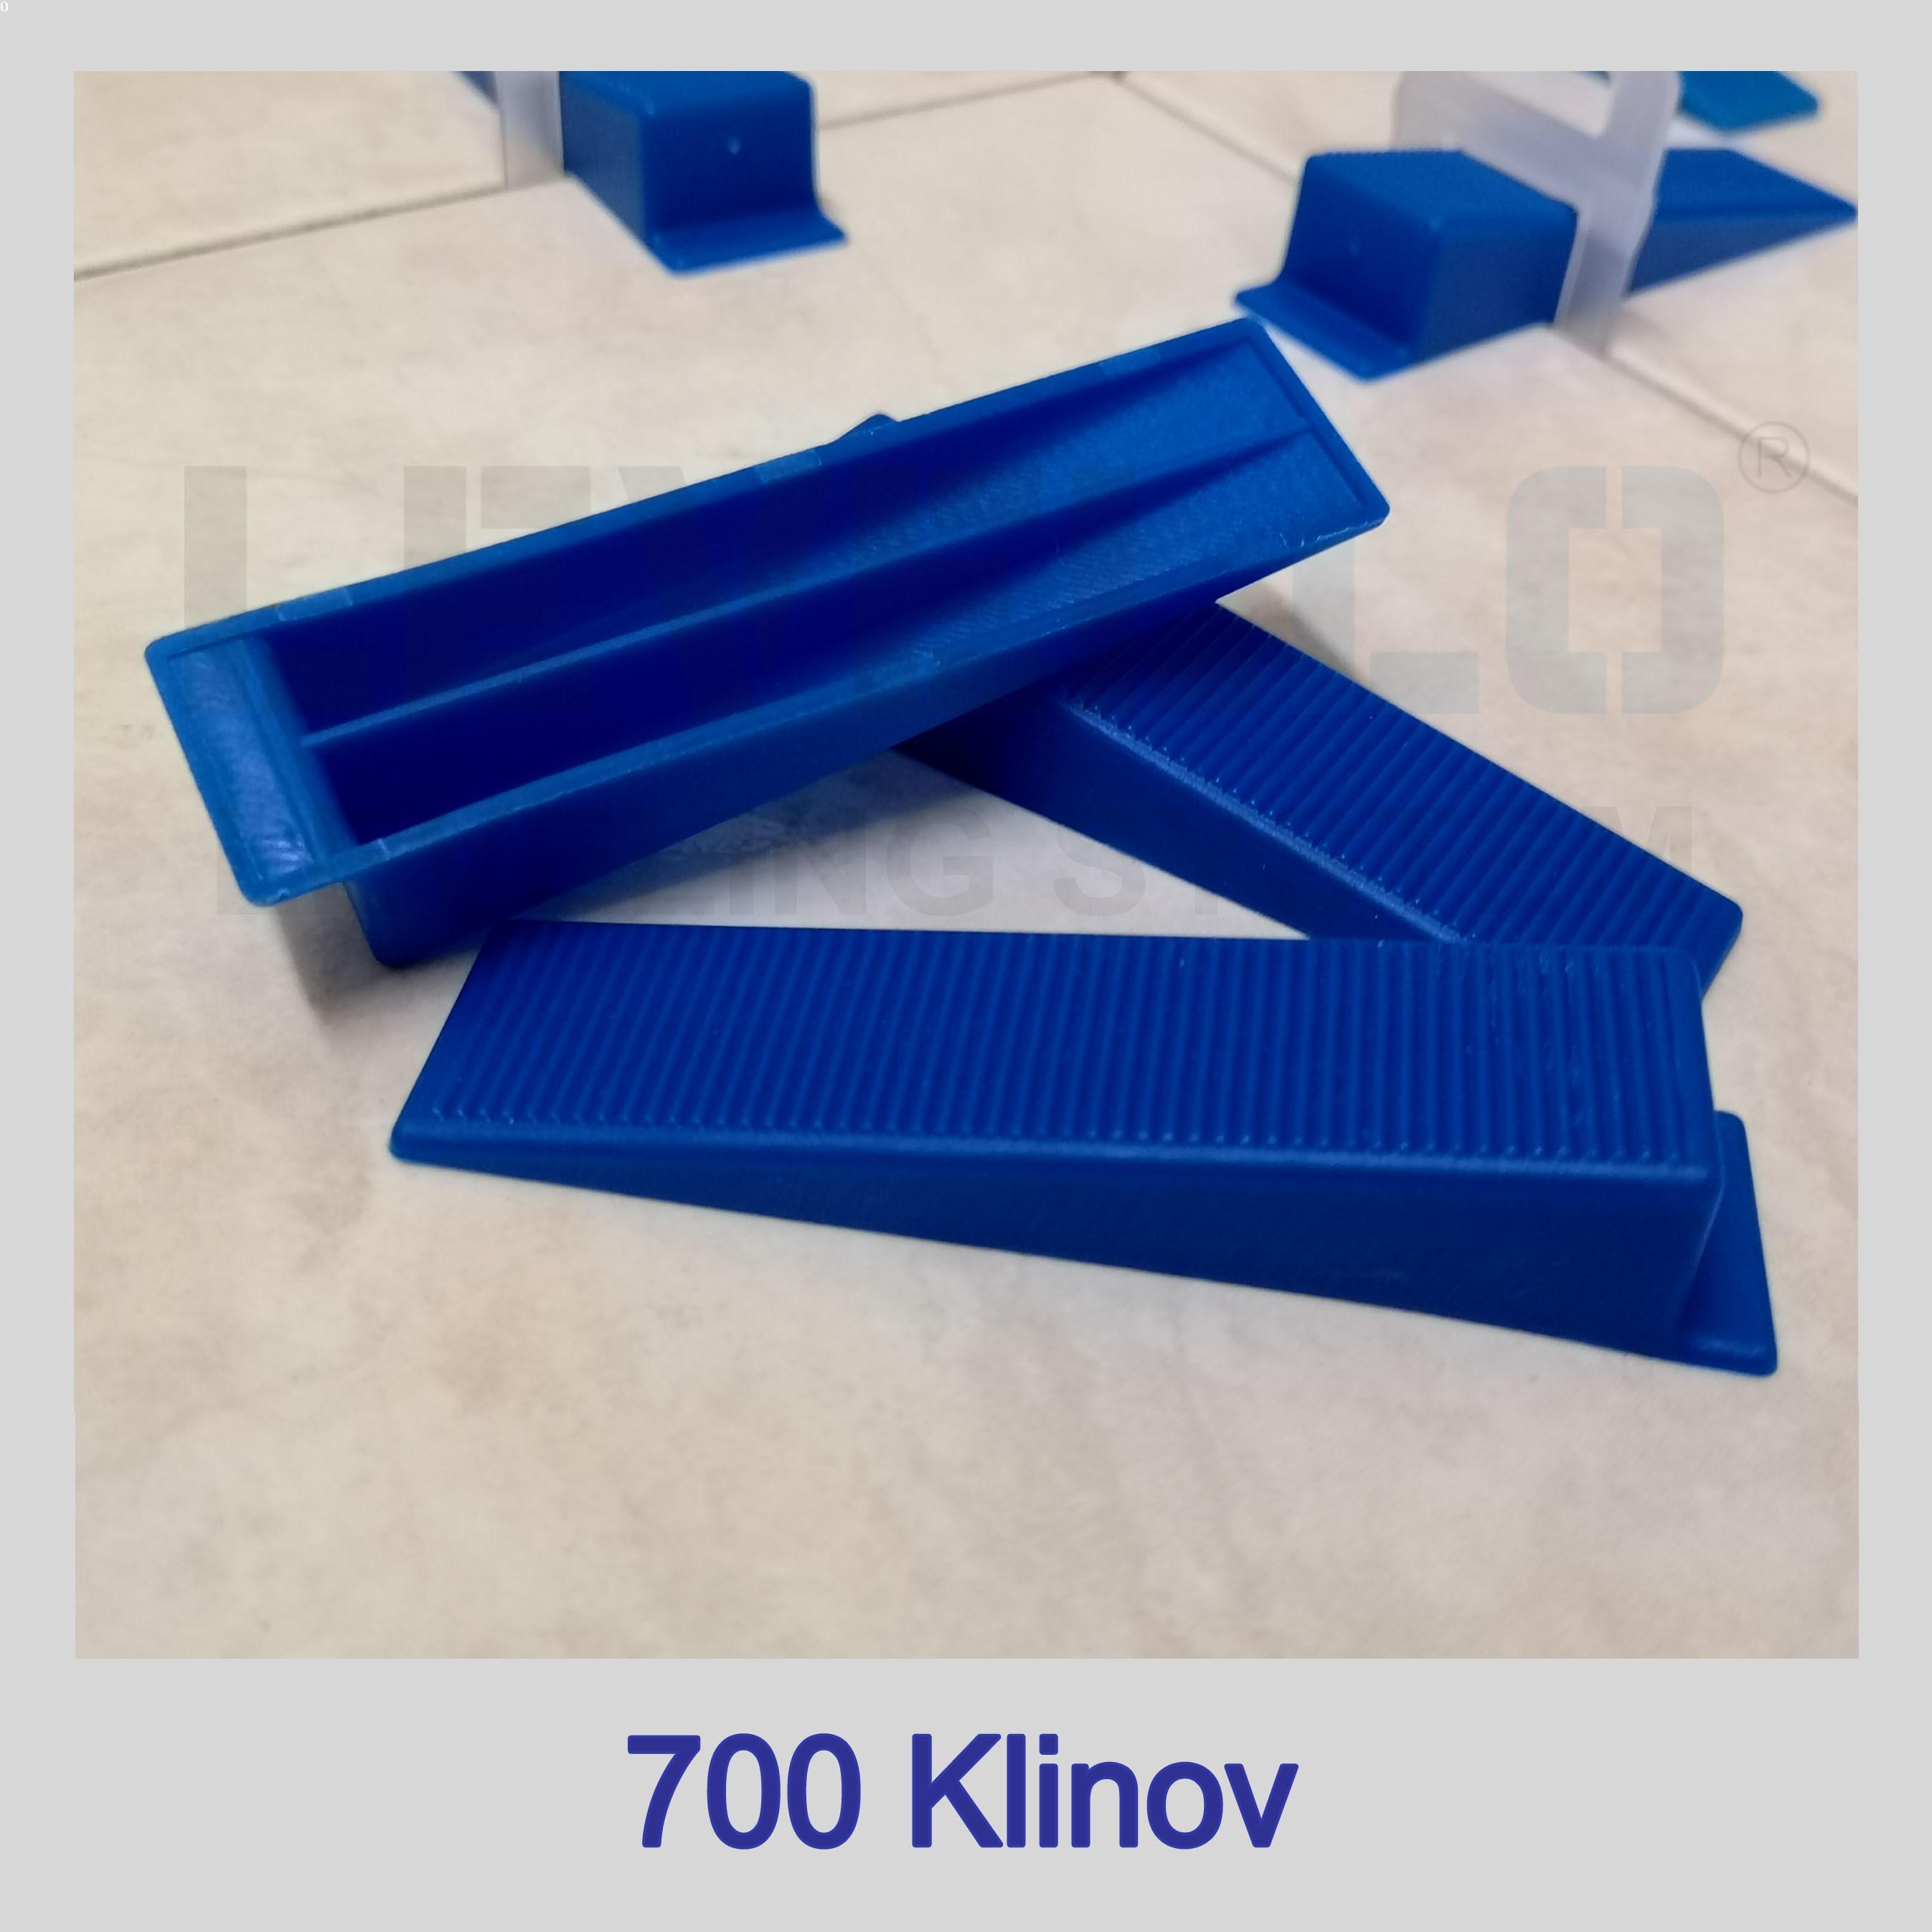 Nivelačné kliny modré, 700 kusov